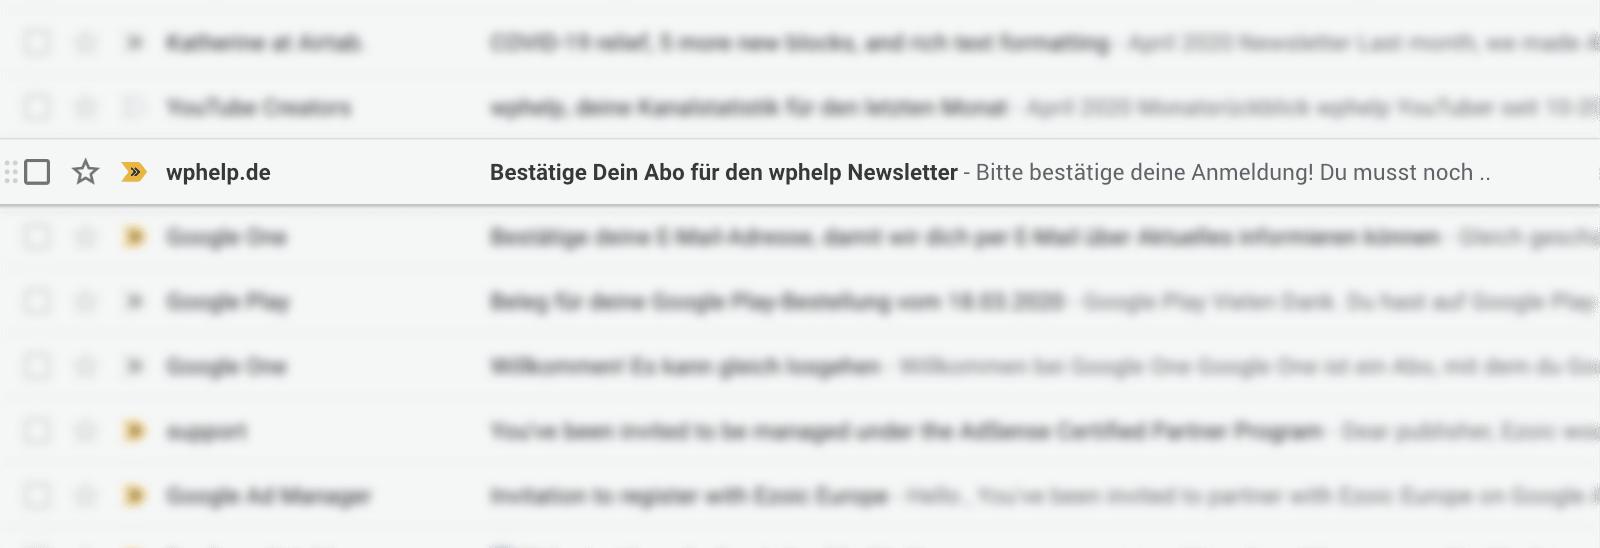 Confirmation Screenshot wphelp.de